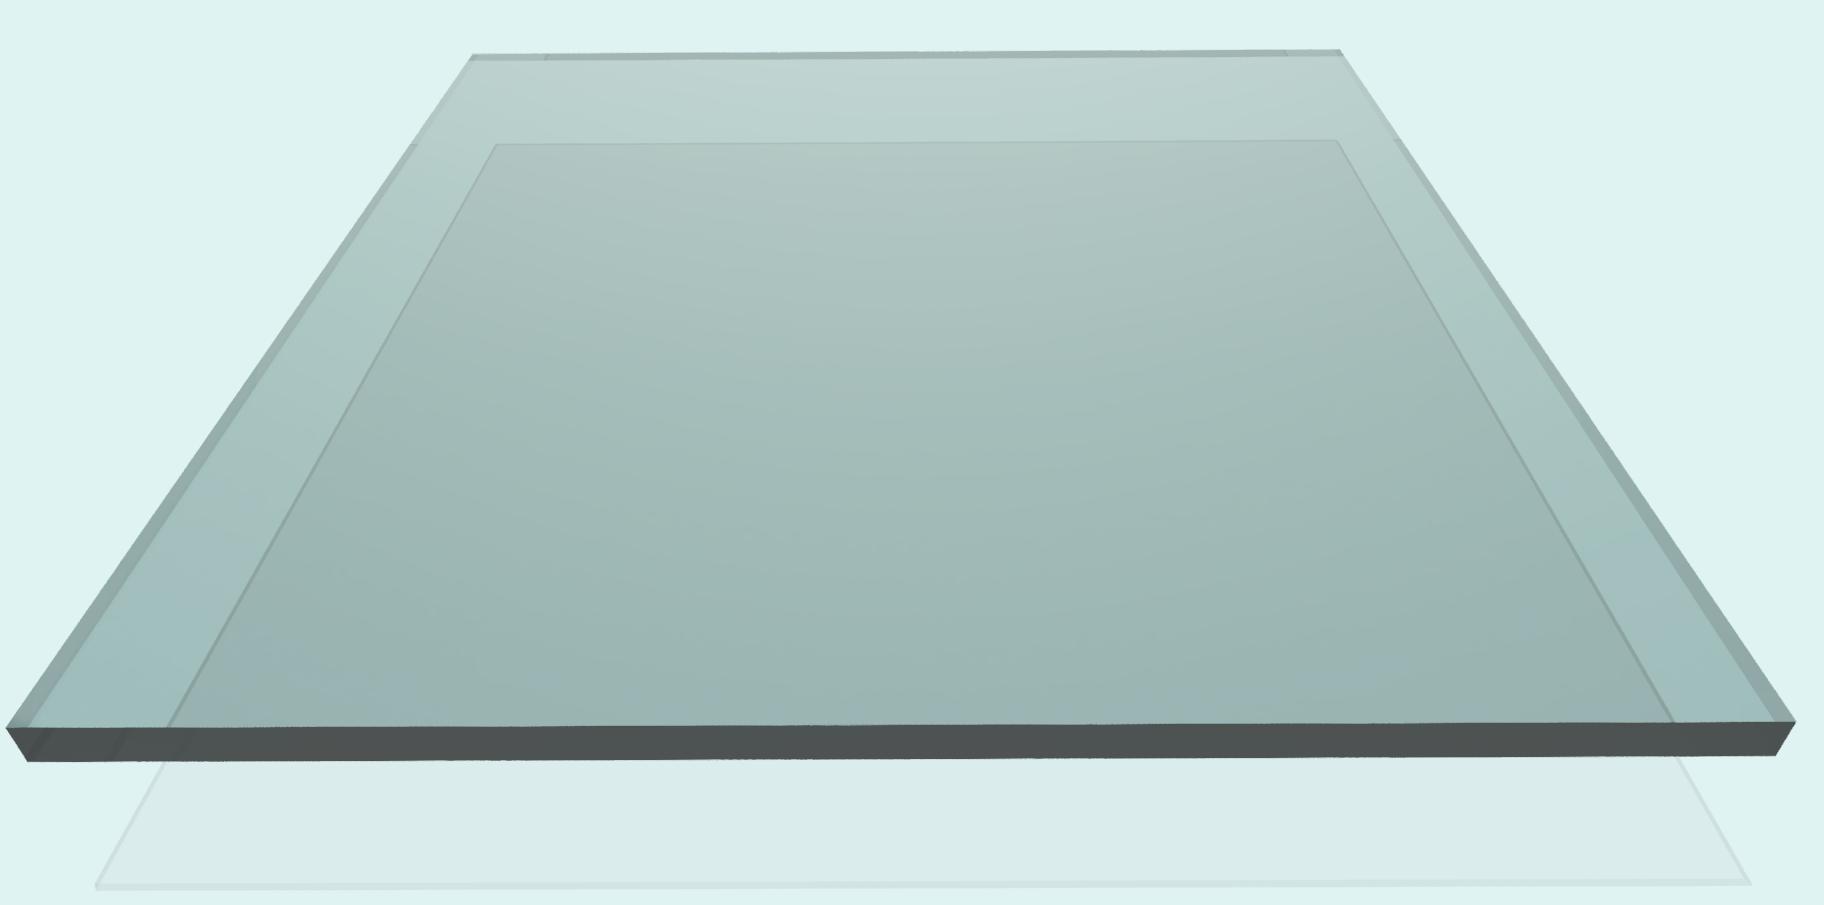 Plexiglas 6 mm, klar